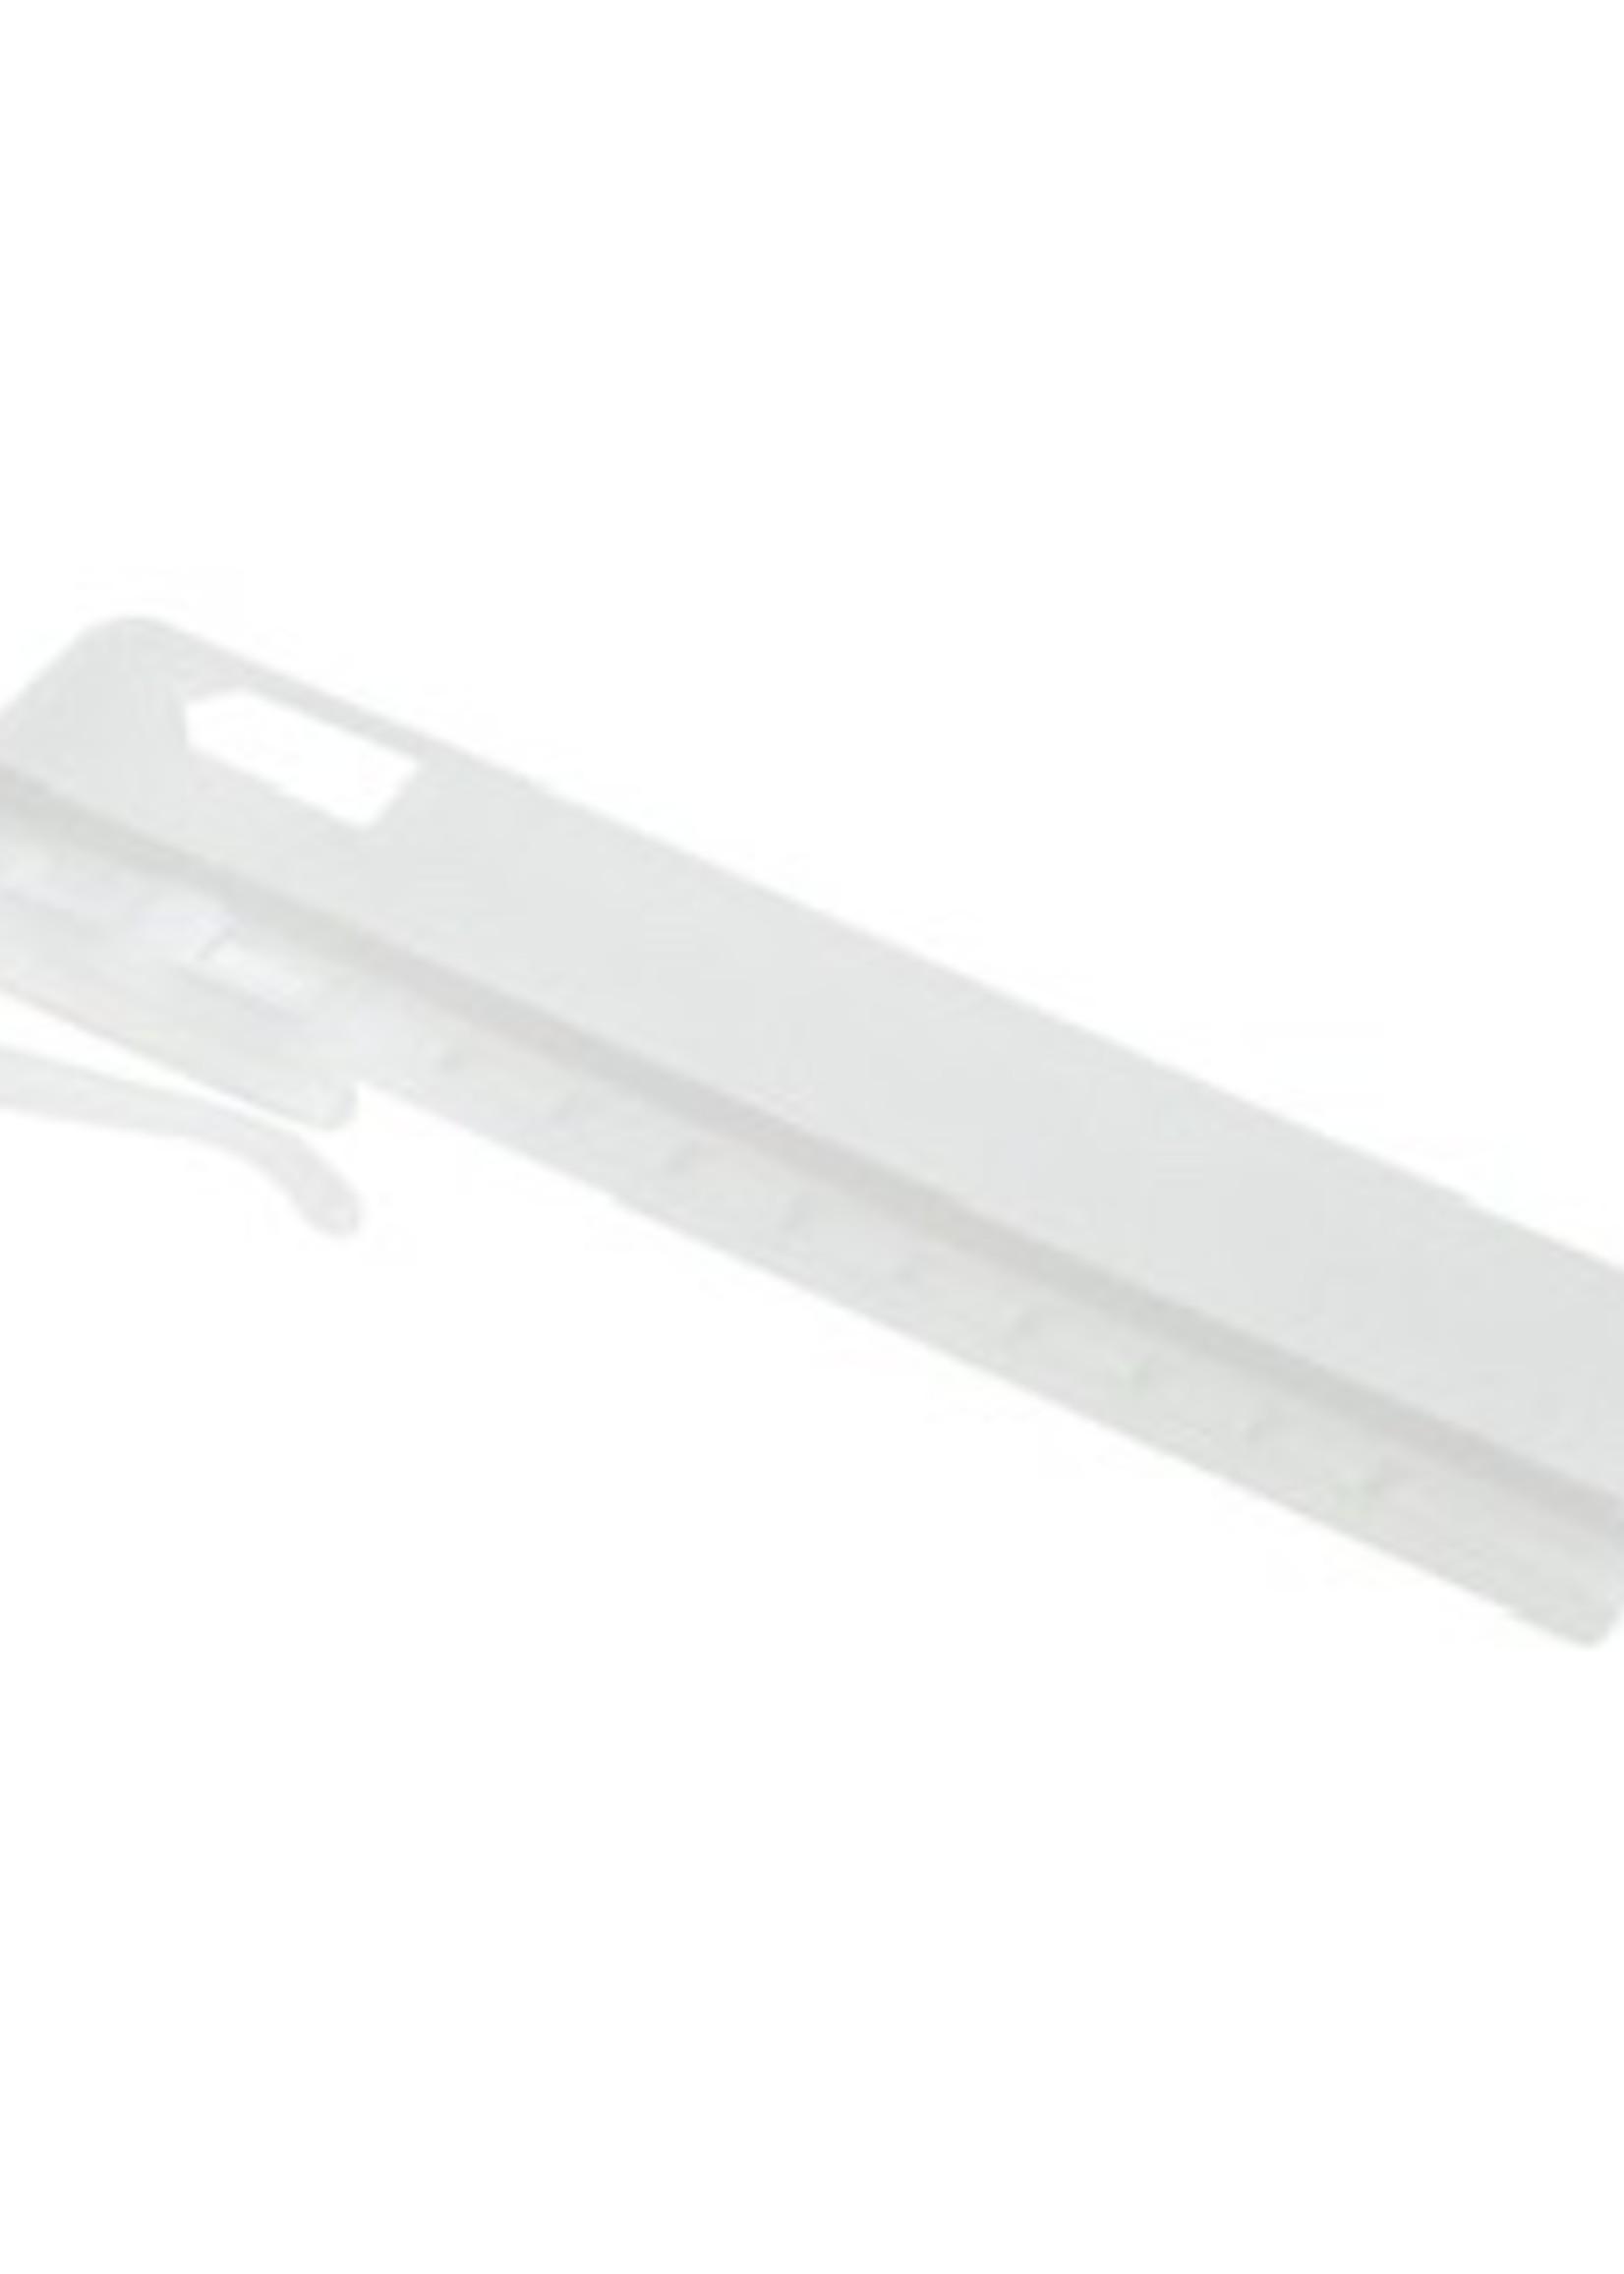 Mobyflex Innaai verstelbare gordijnhaak 7,5cm  verpakt per 200 stuks